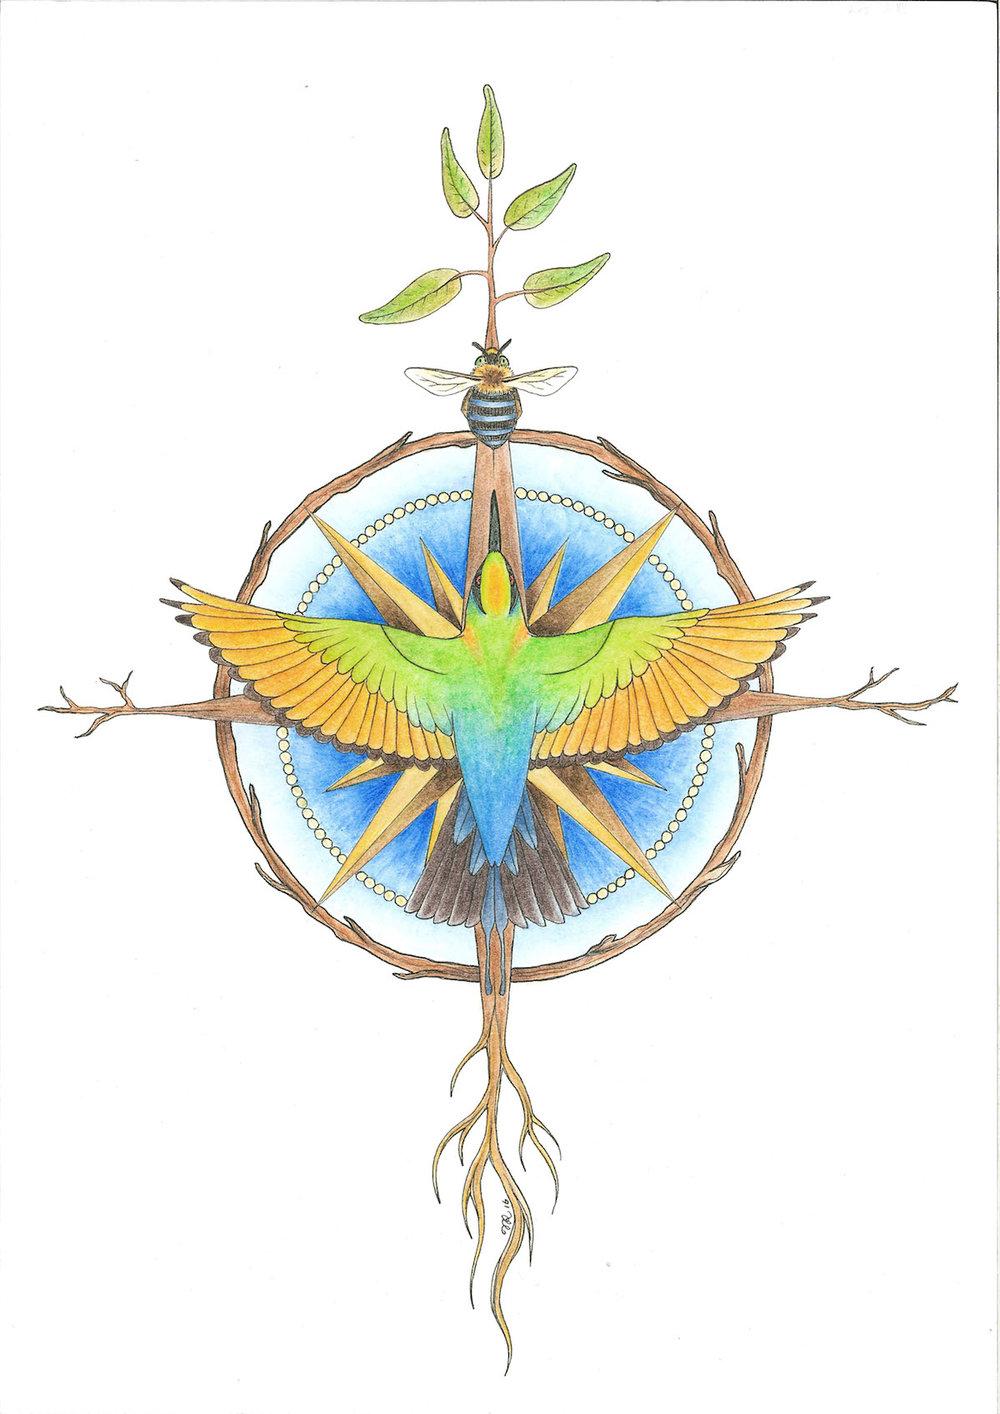 Natures Compass